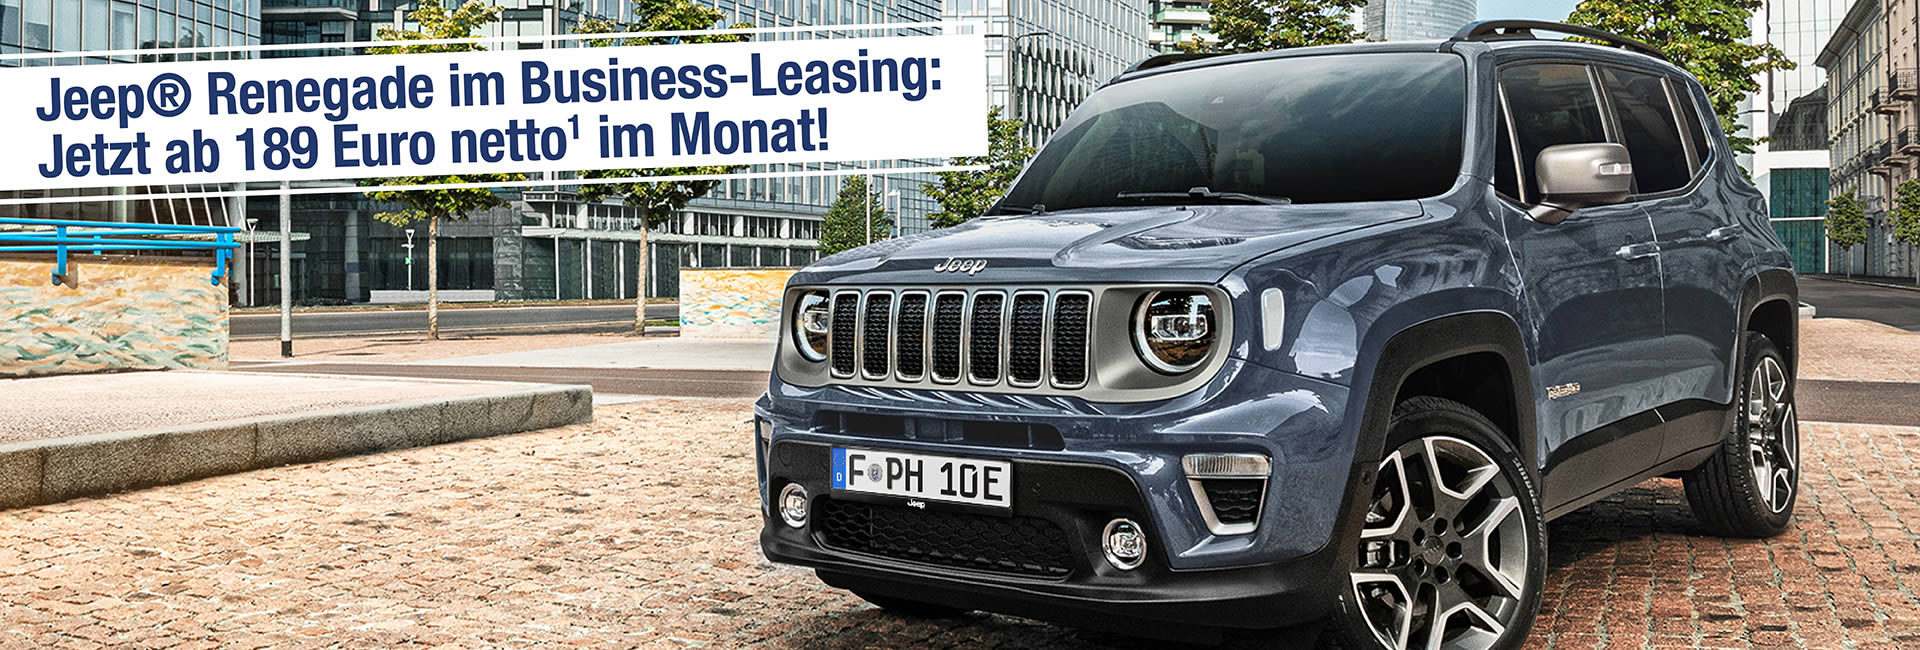 Slider – Jeep Renegade Leasing Angebot Autohaus Mayrhoermann GmbH in Augsburg – Diedorf